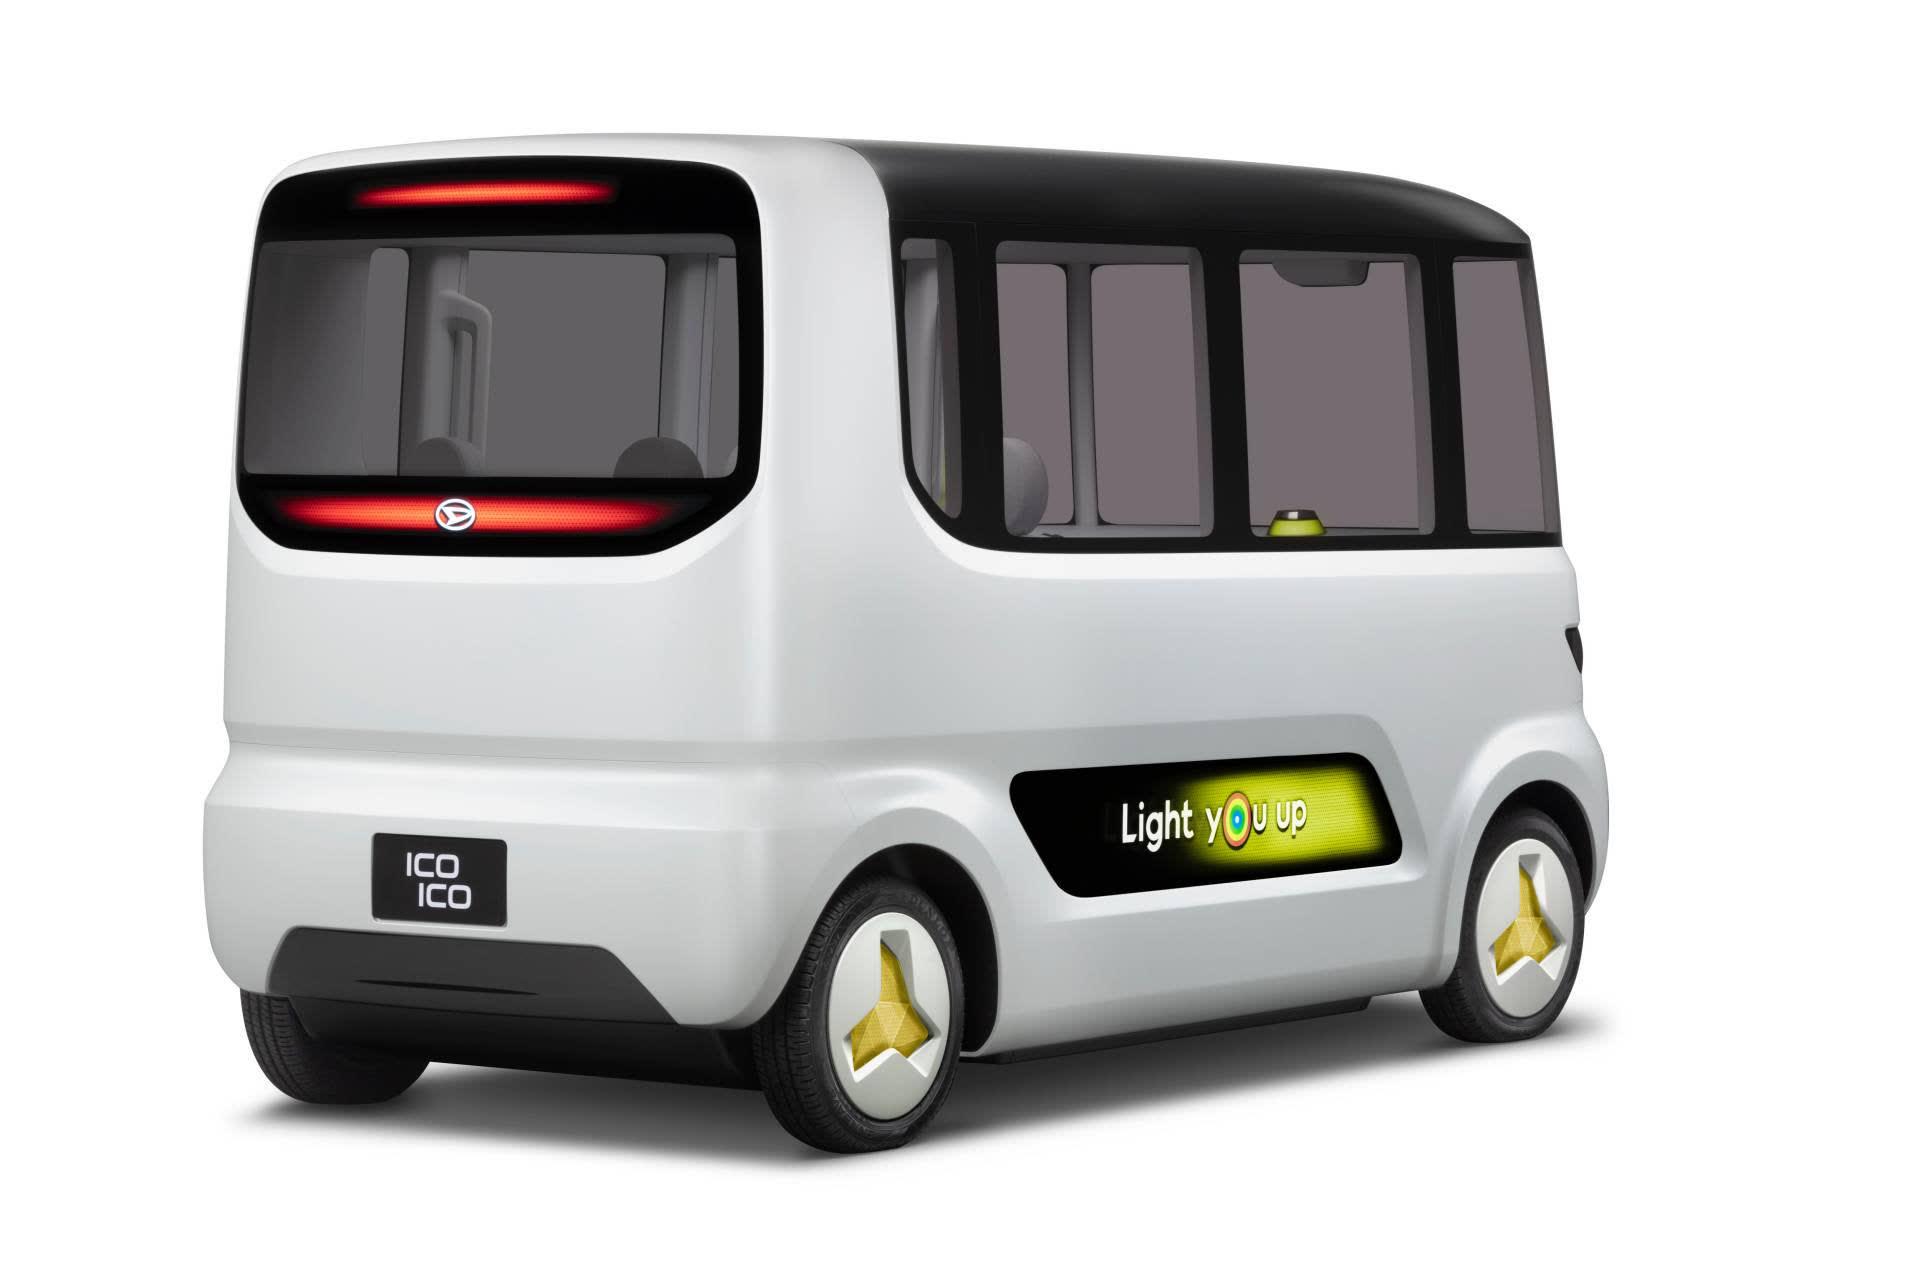 3f2a213e-daihatsu-ico-ico-concept-1